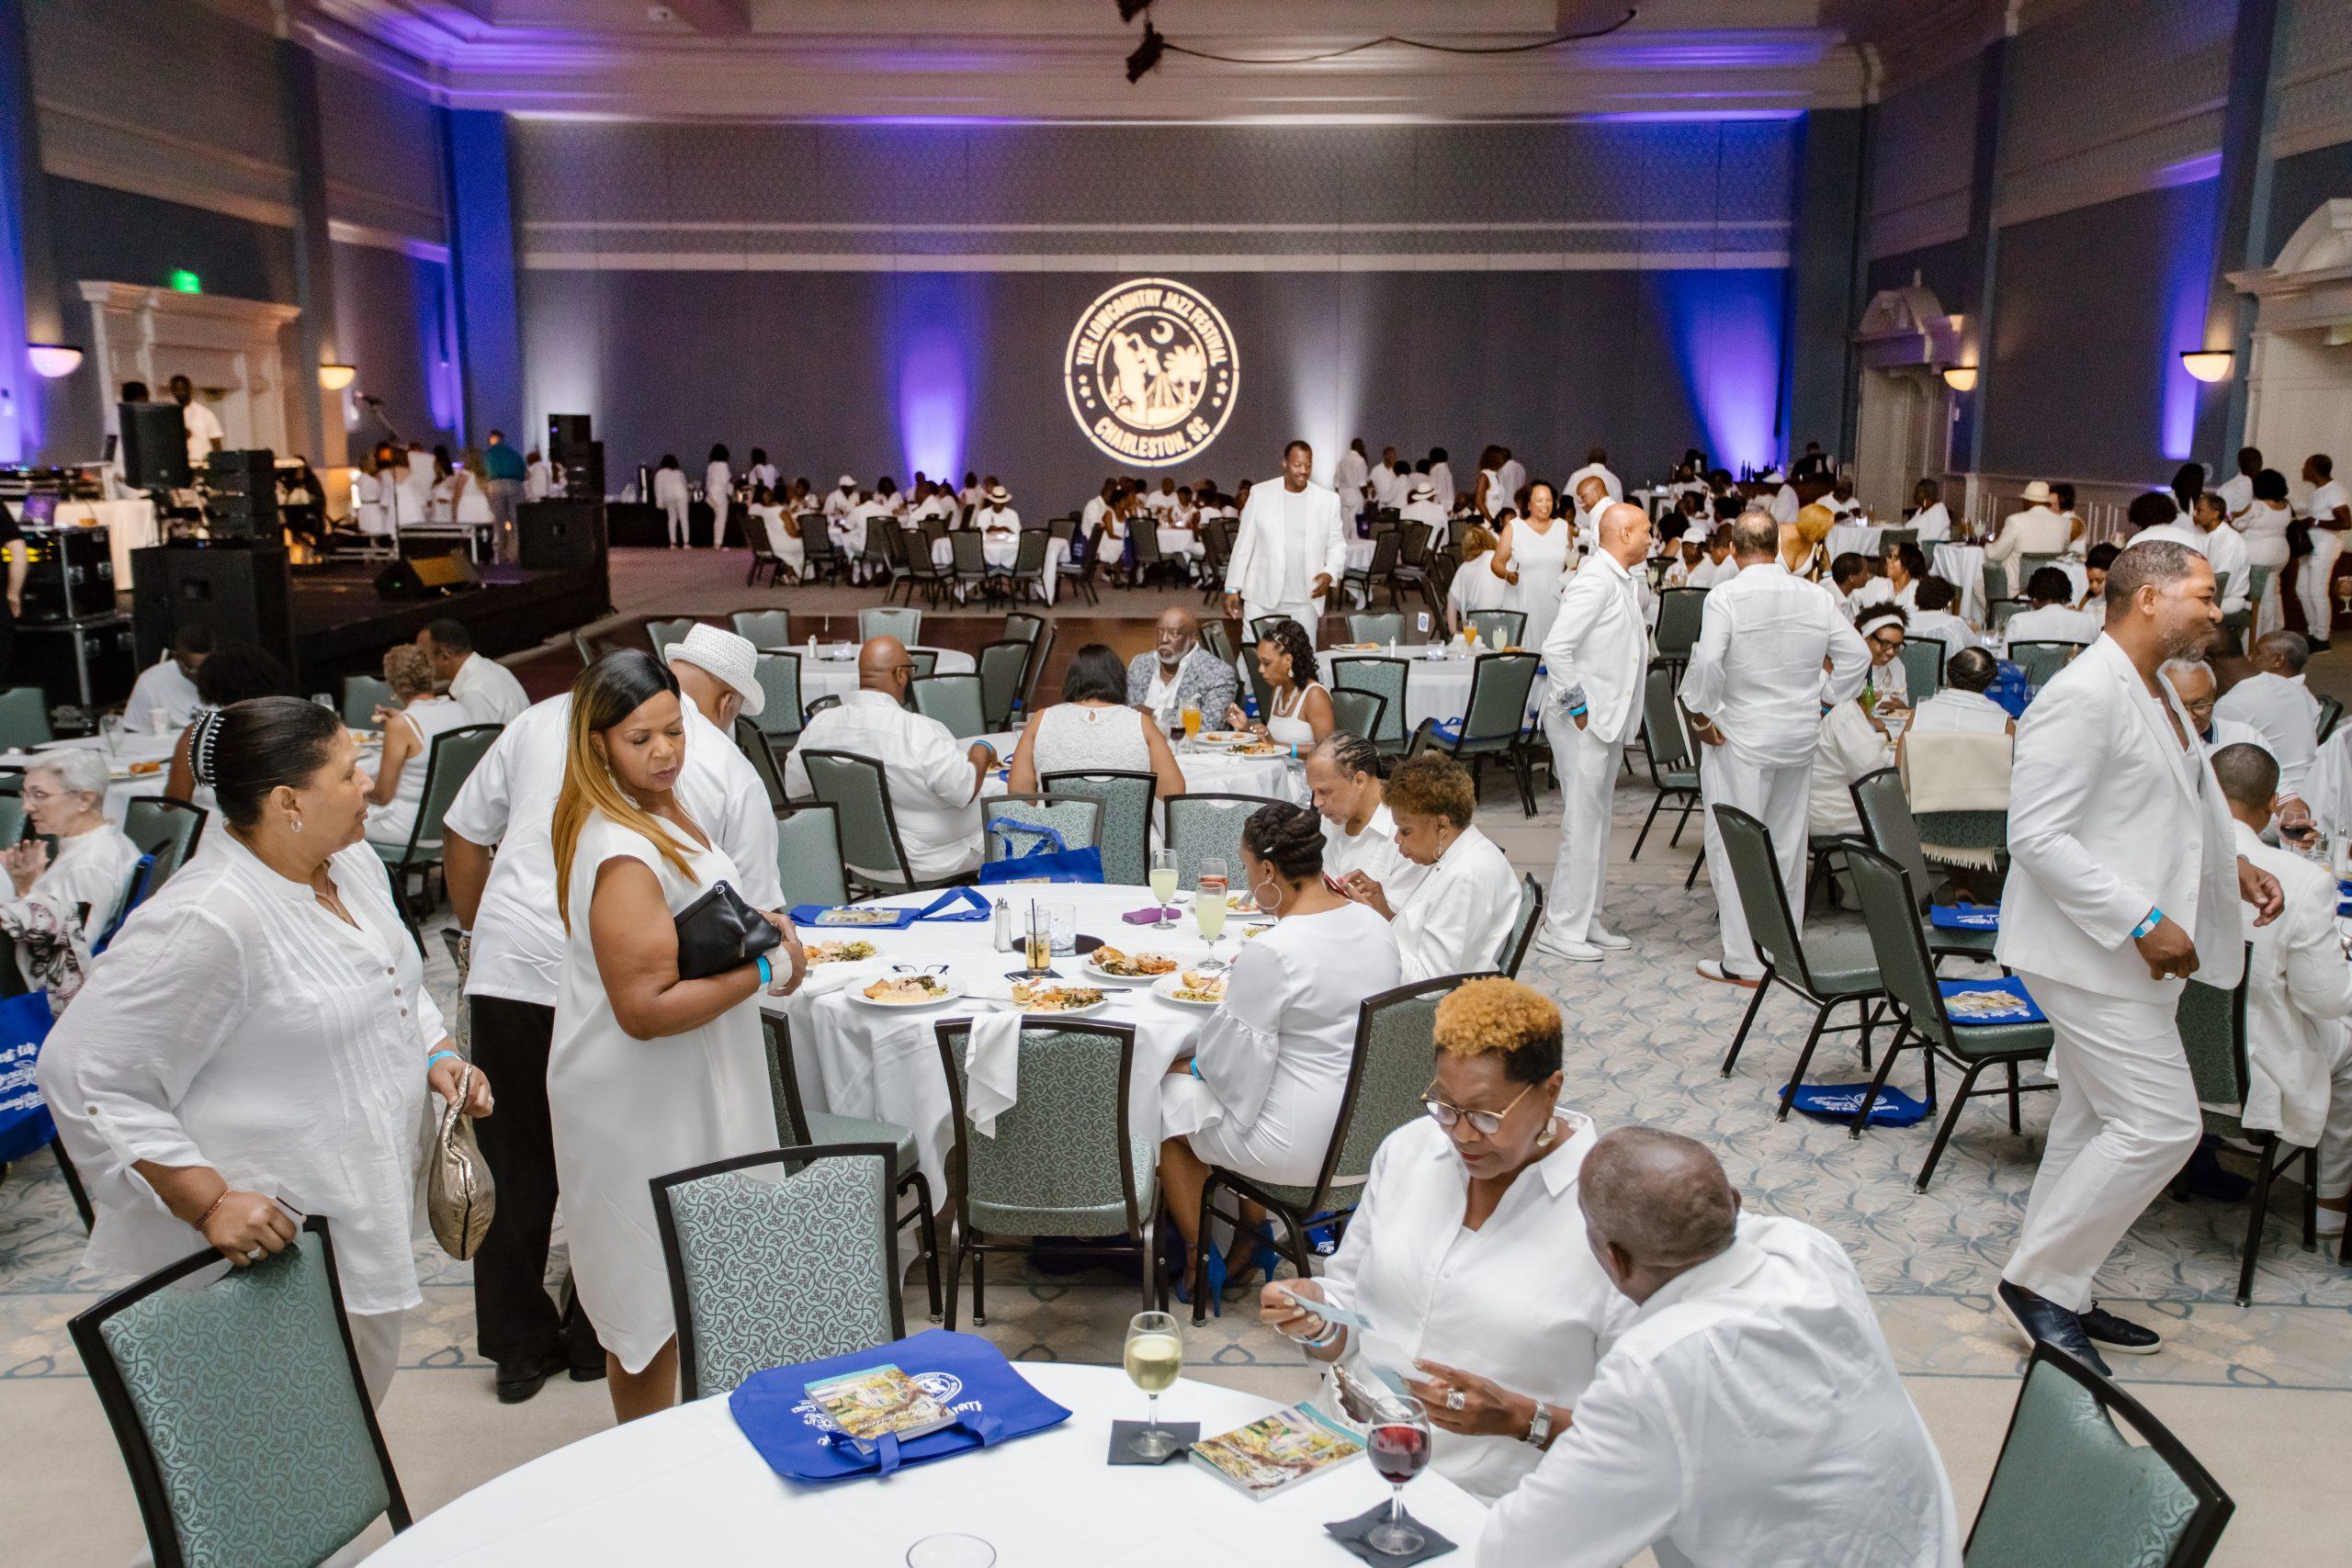 LOWCOUNTRY JAZZ FESTIVAL WHITE PARTY @ Charleston Gaillard Center